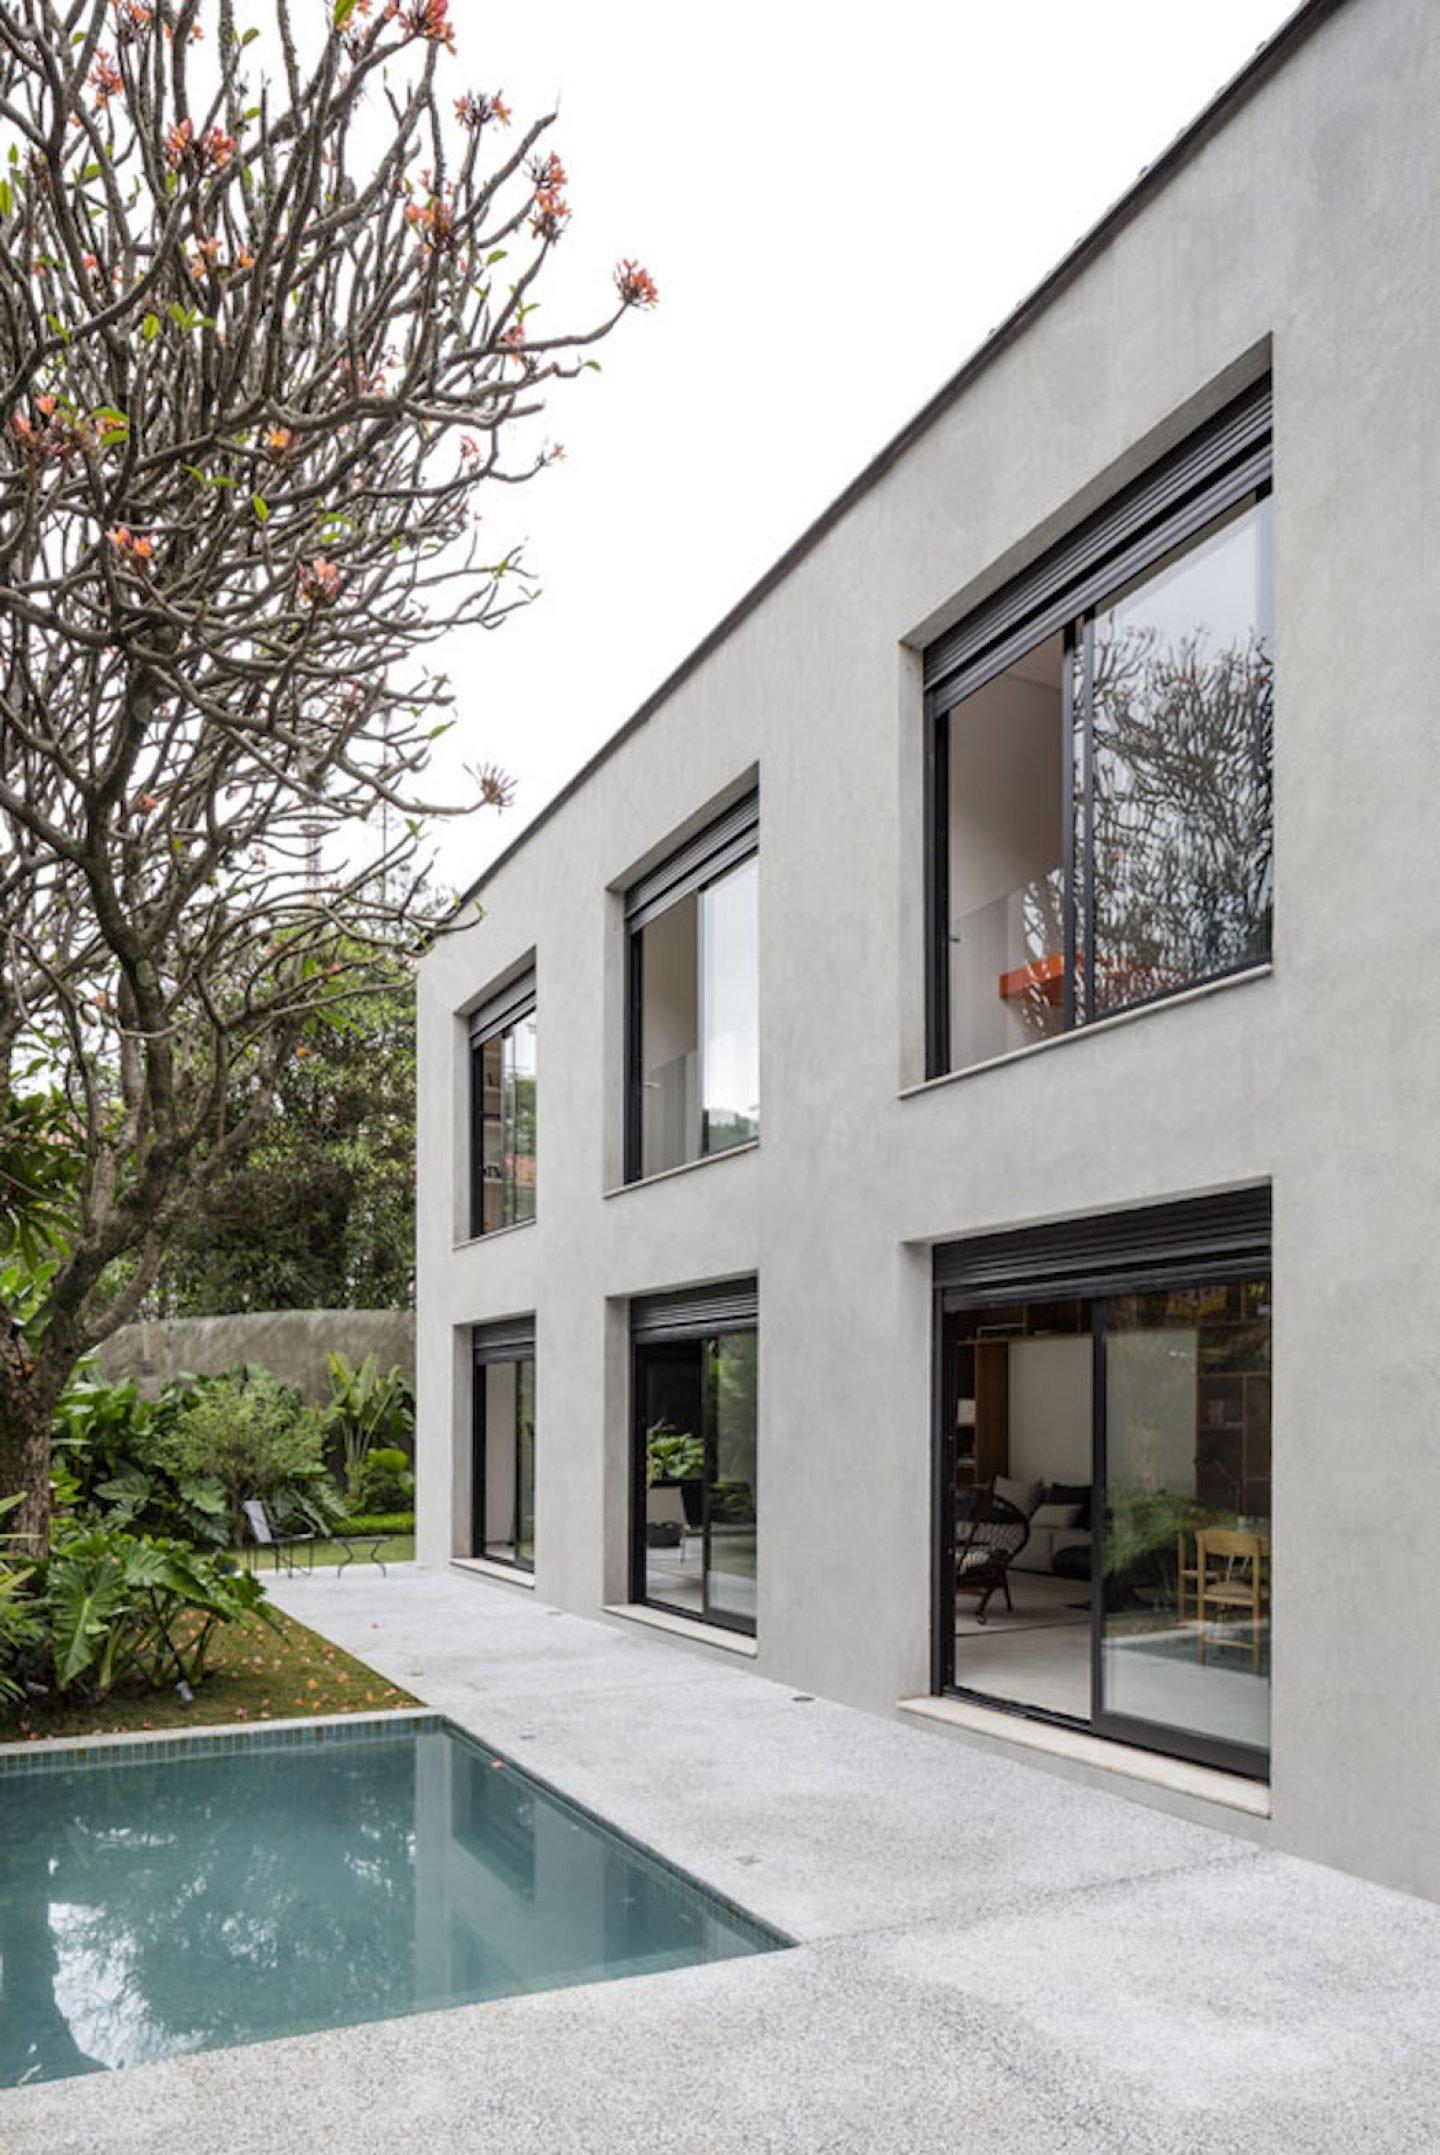 Felipe_Hess_Architecture_9357